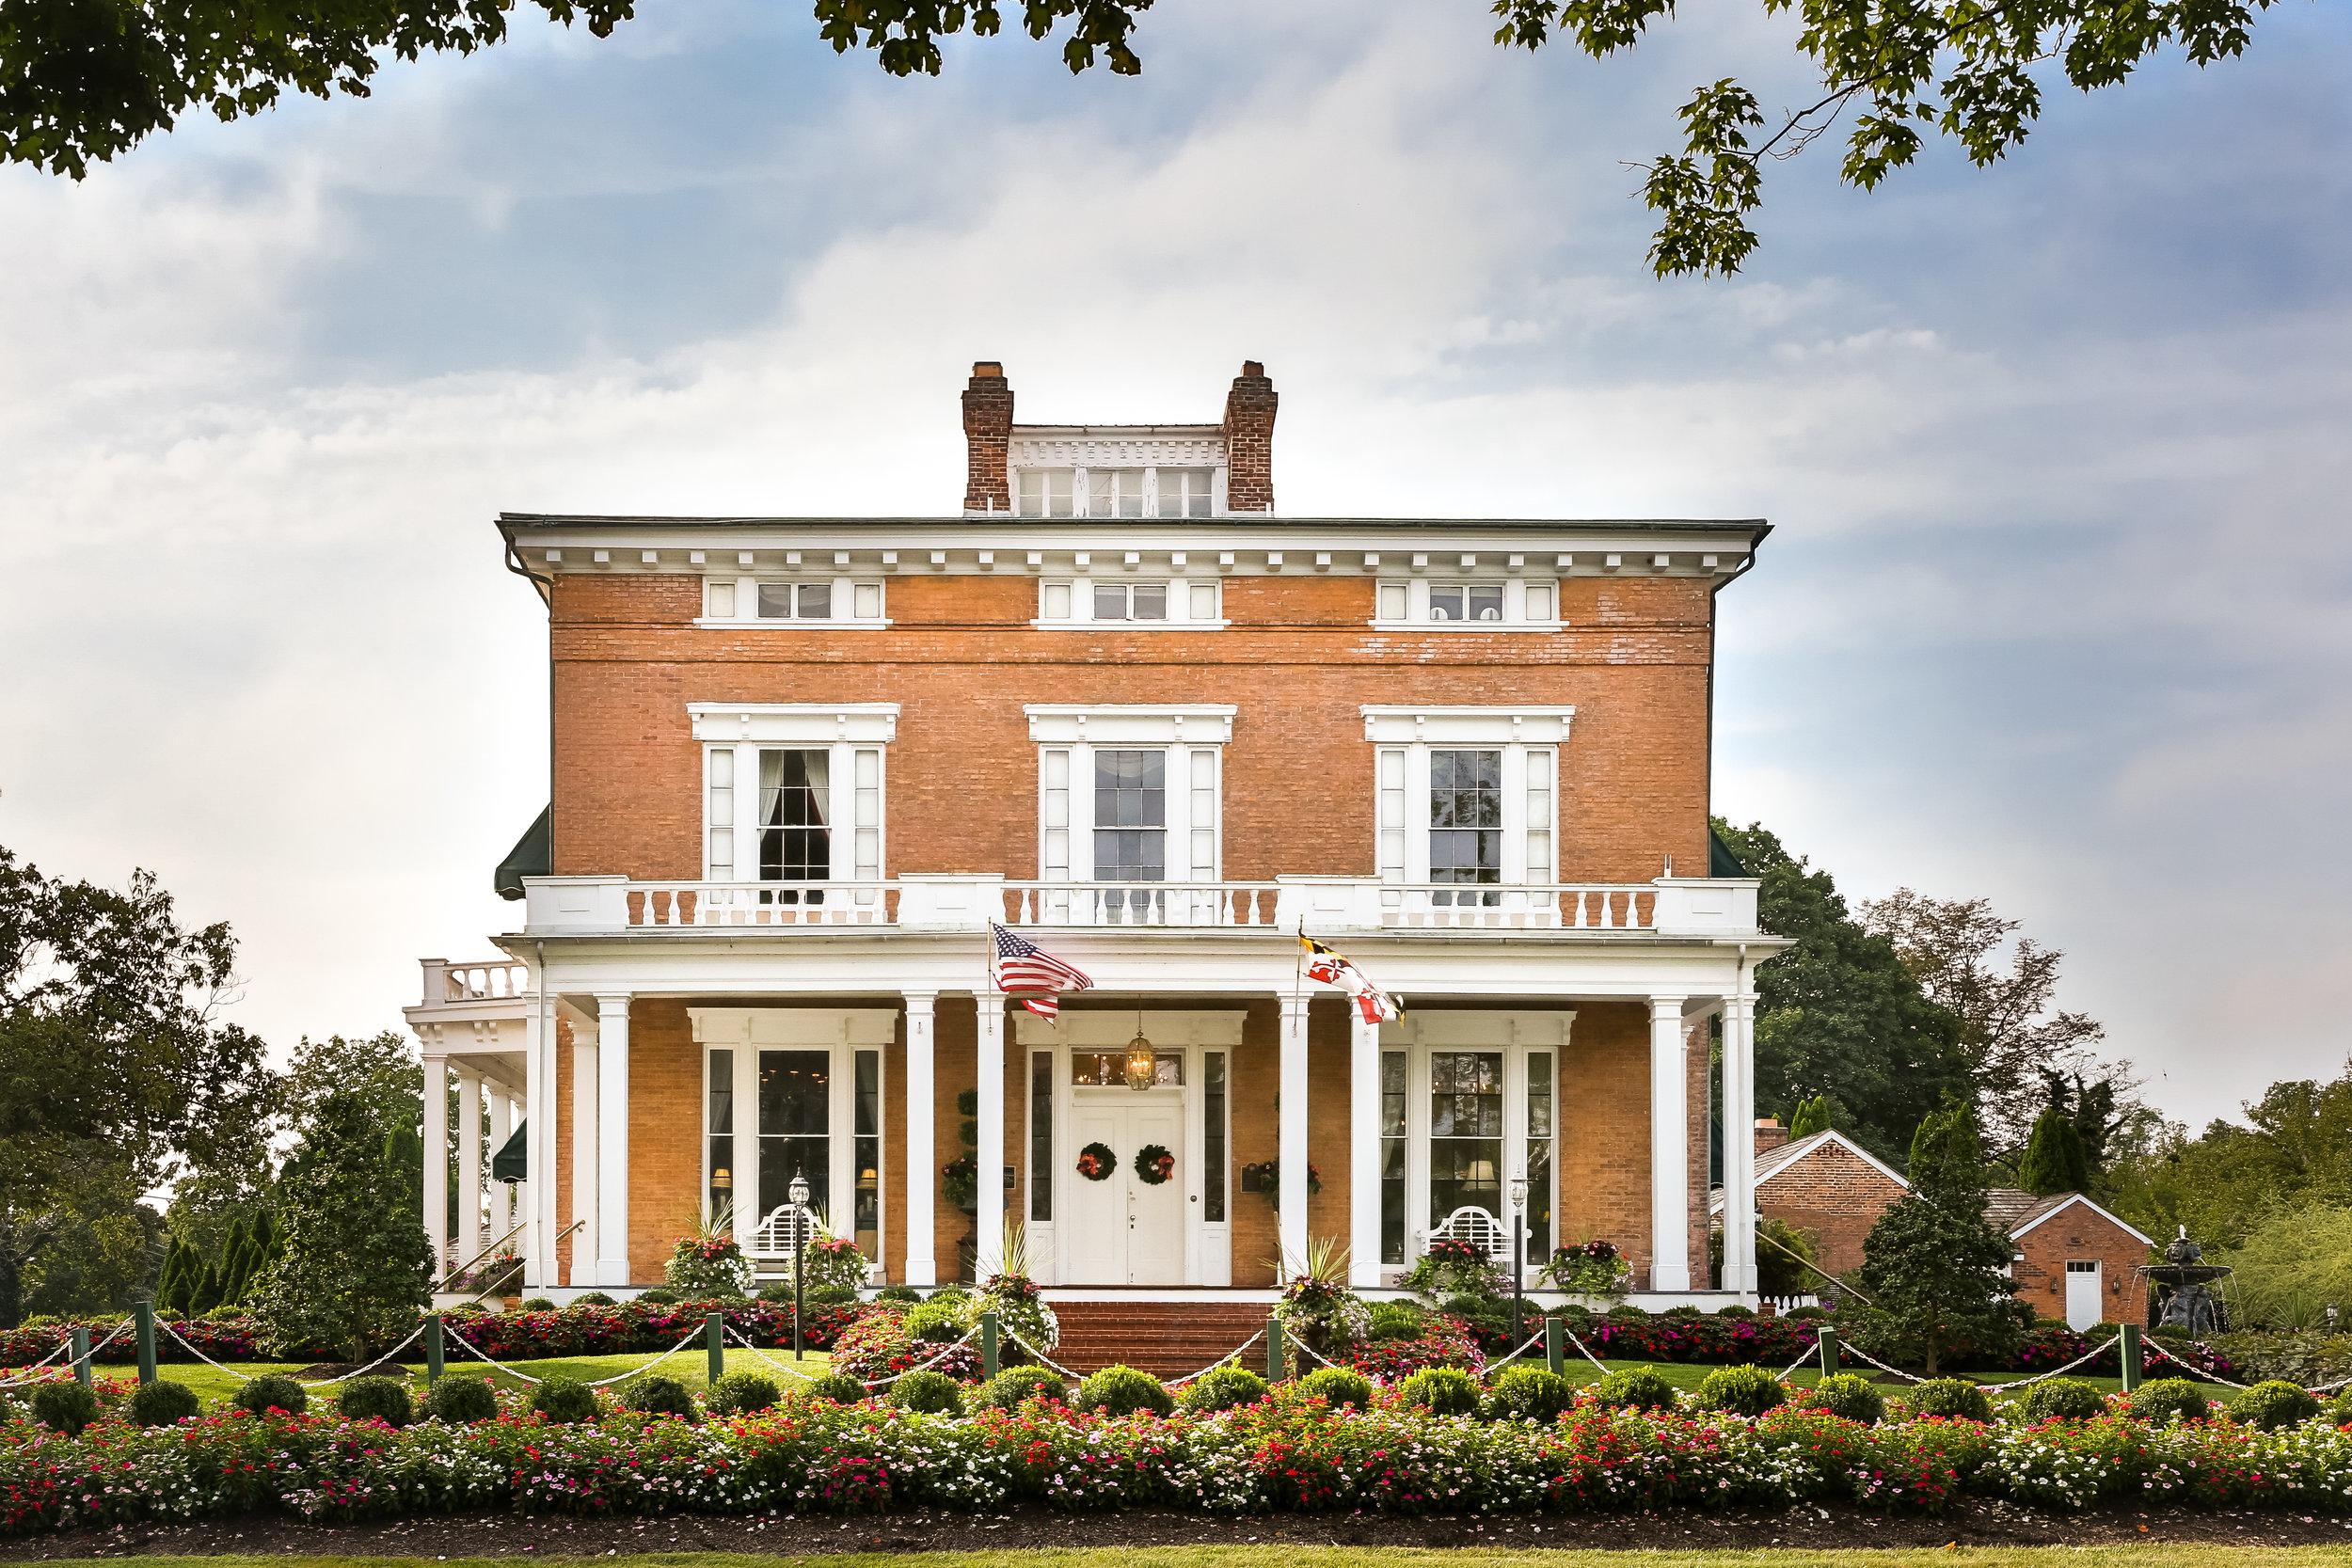 Antrim 1844 Mansion and Estate